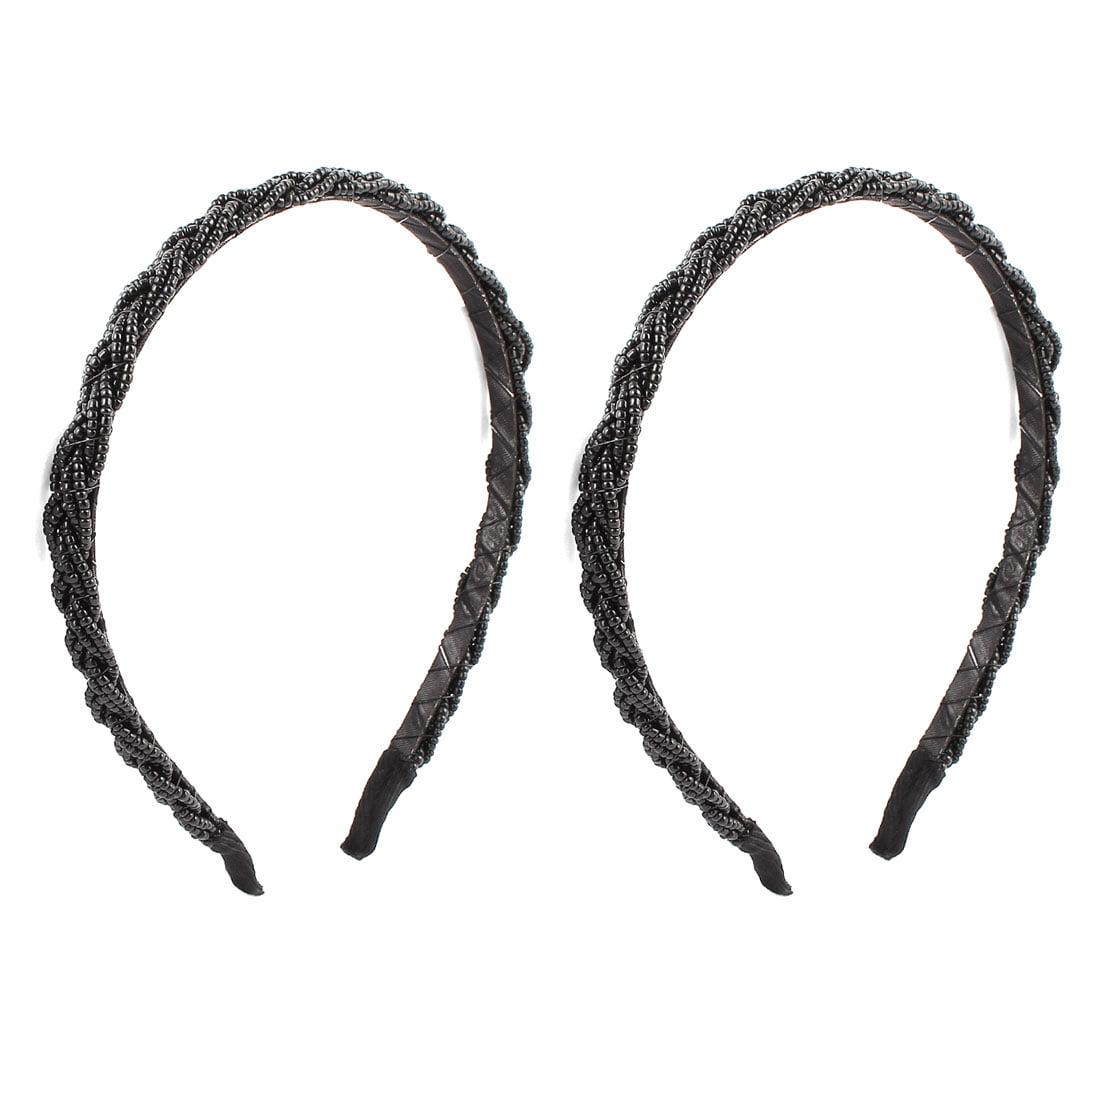 2 Pcs Black Plastic Beads Detail Metal Hair Band Headbands for Ladies - image 3 of 3